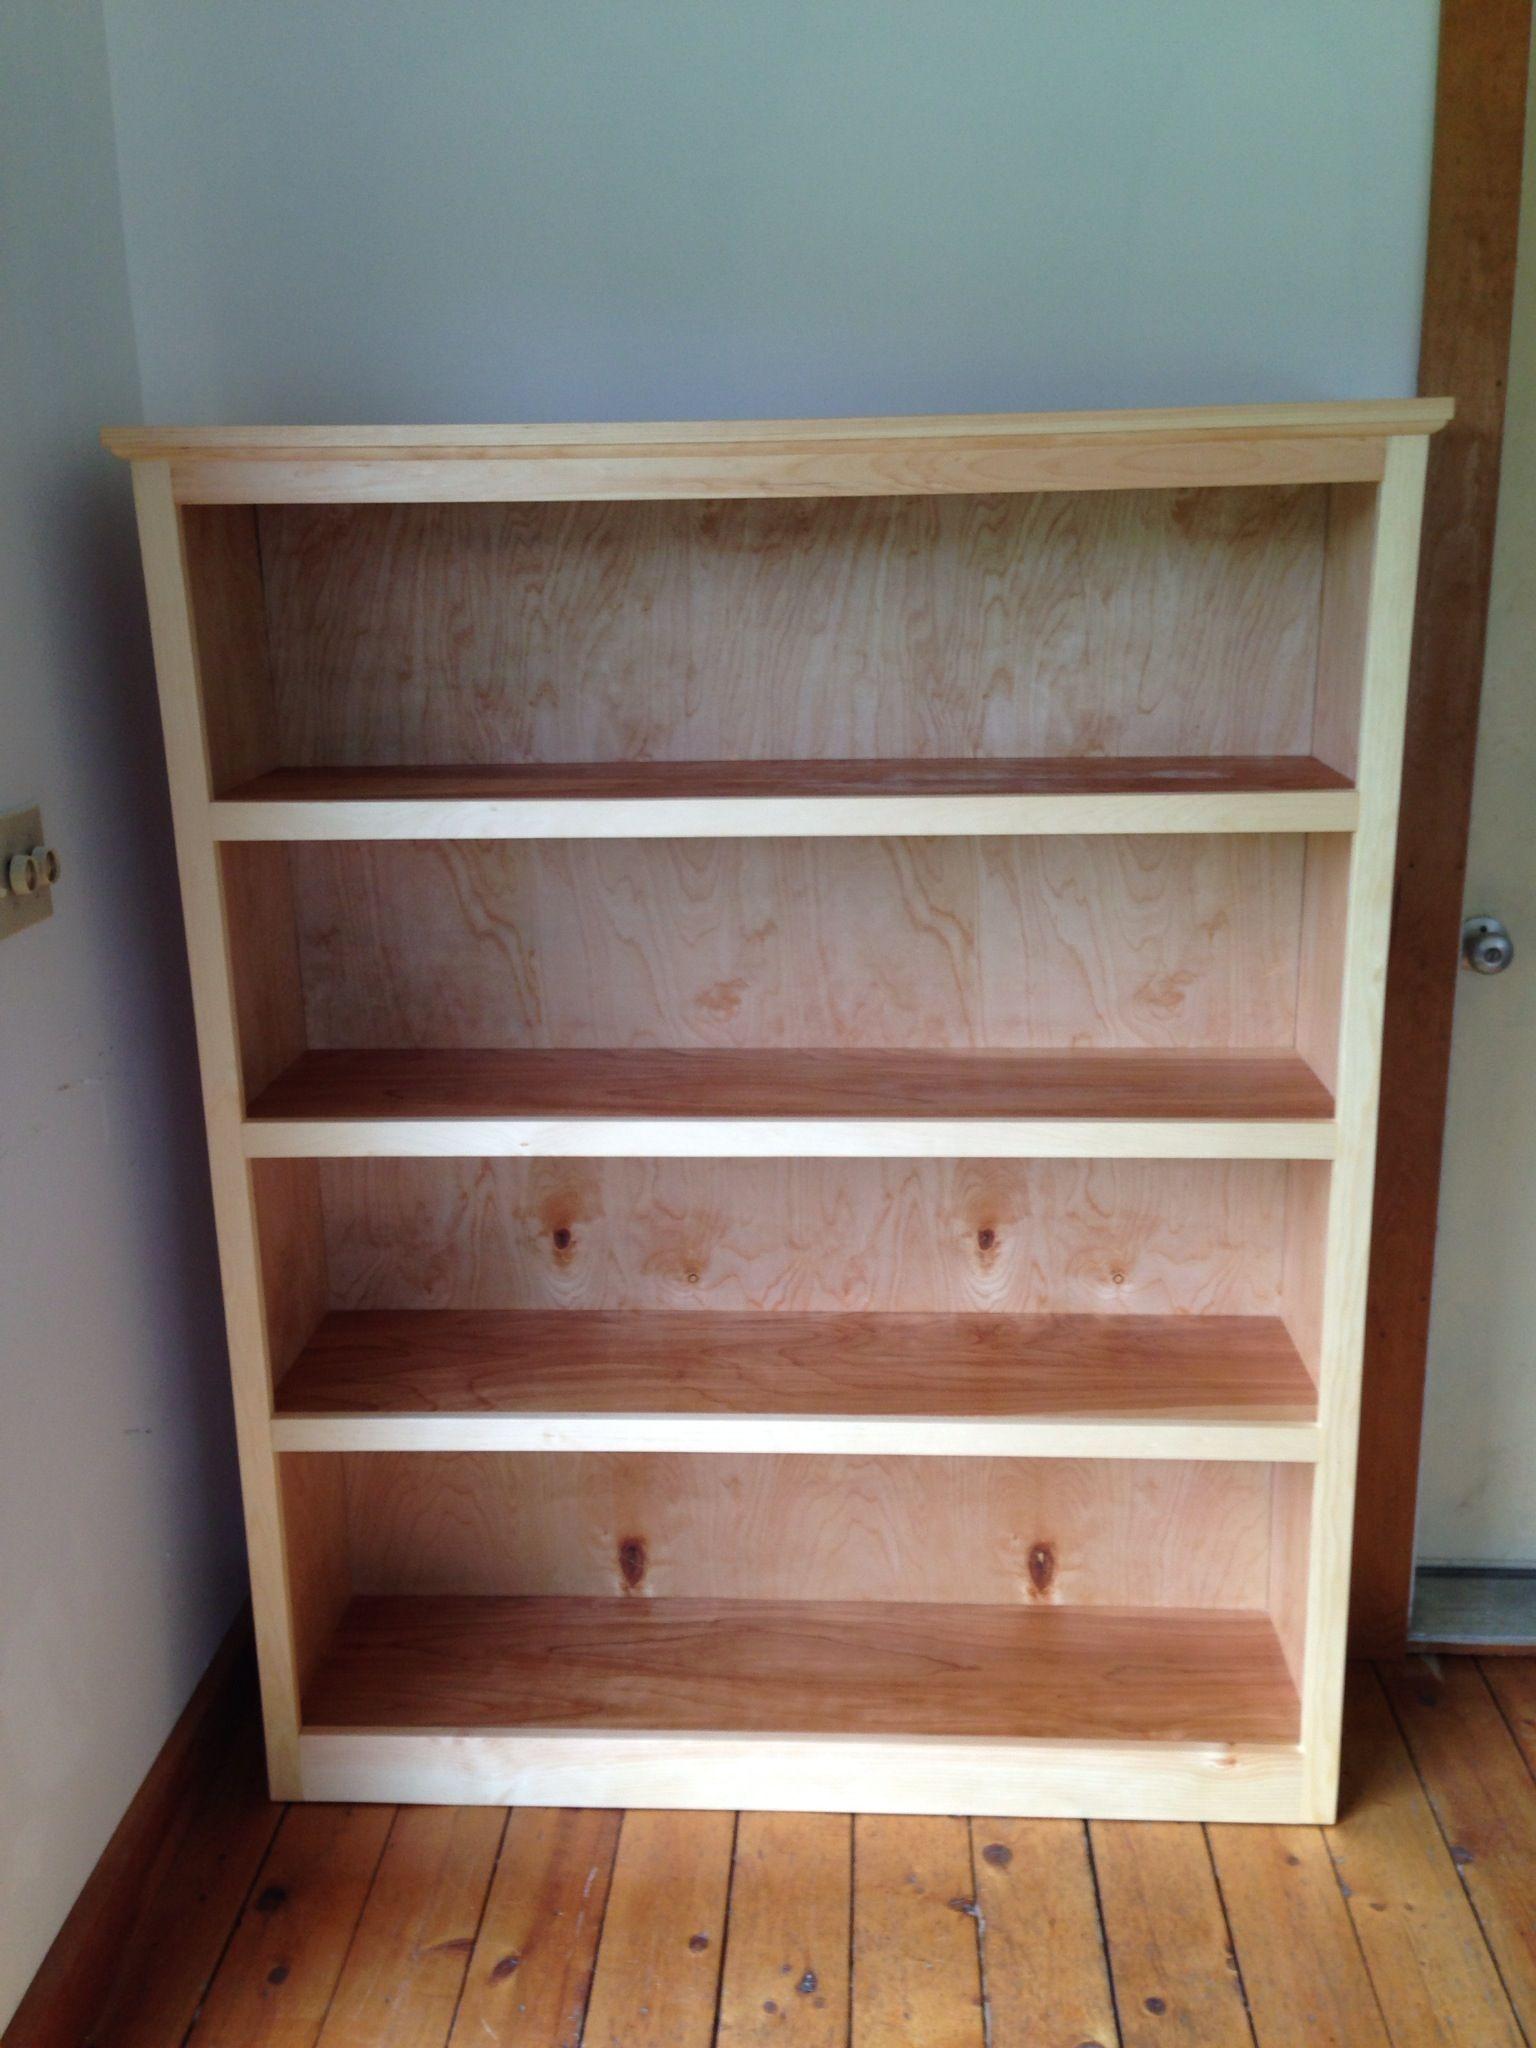 Easy Bookshelf Made With Kreg Jig And Furniture Grade Plywood